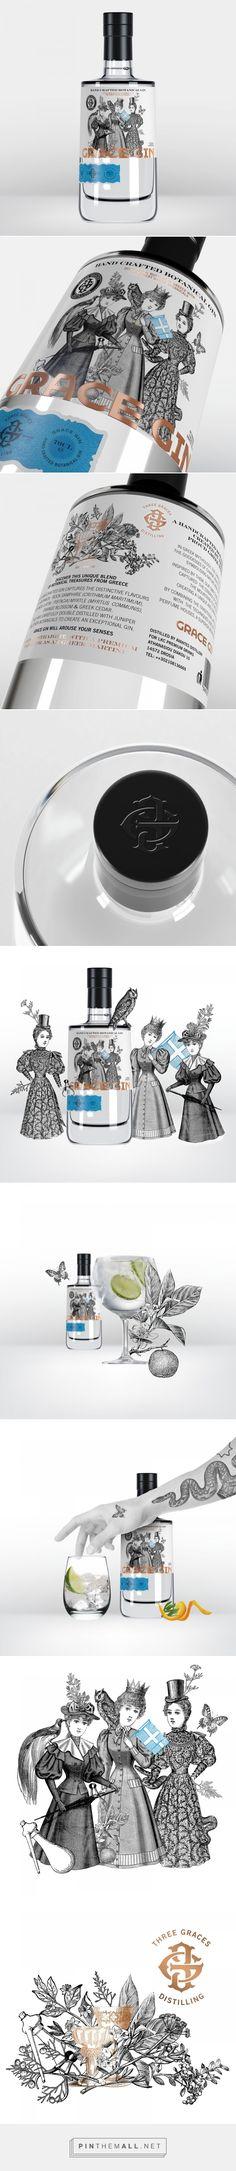 Grace Gin packaging design by MILK Branding Professsionals - https://www.packagingoftheworld.com/2018/03/grace-gin.html